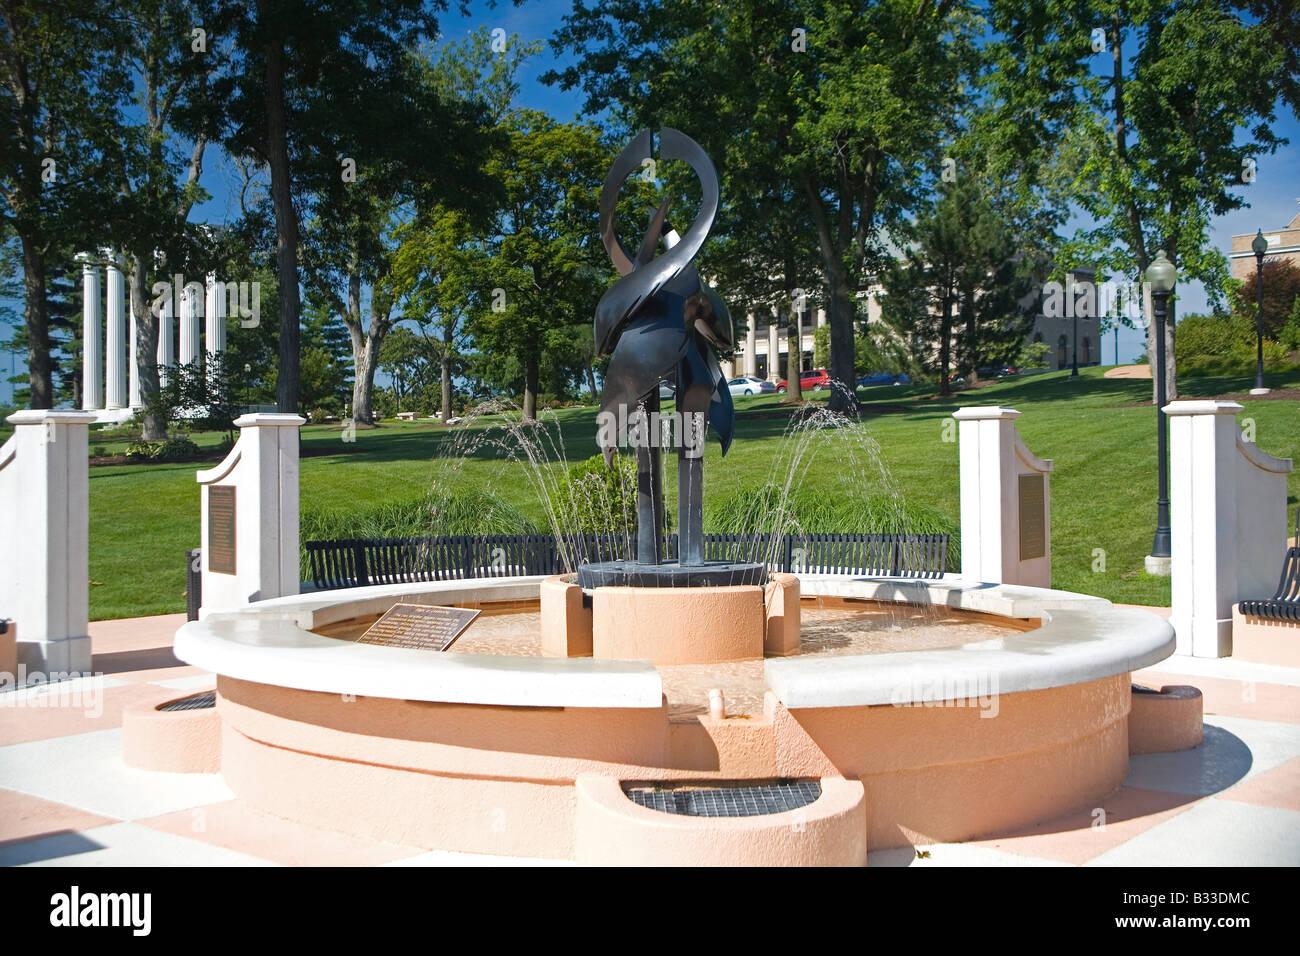 Westminster College Davidson Leadership Plaza - Stock Image